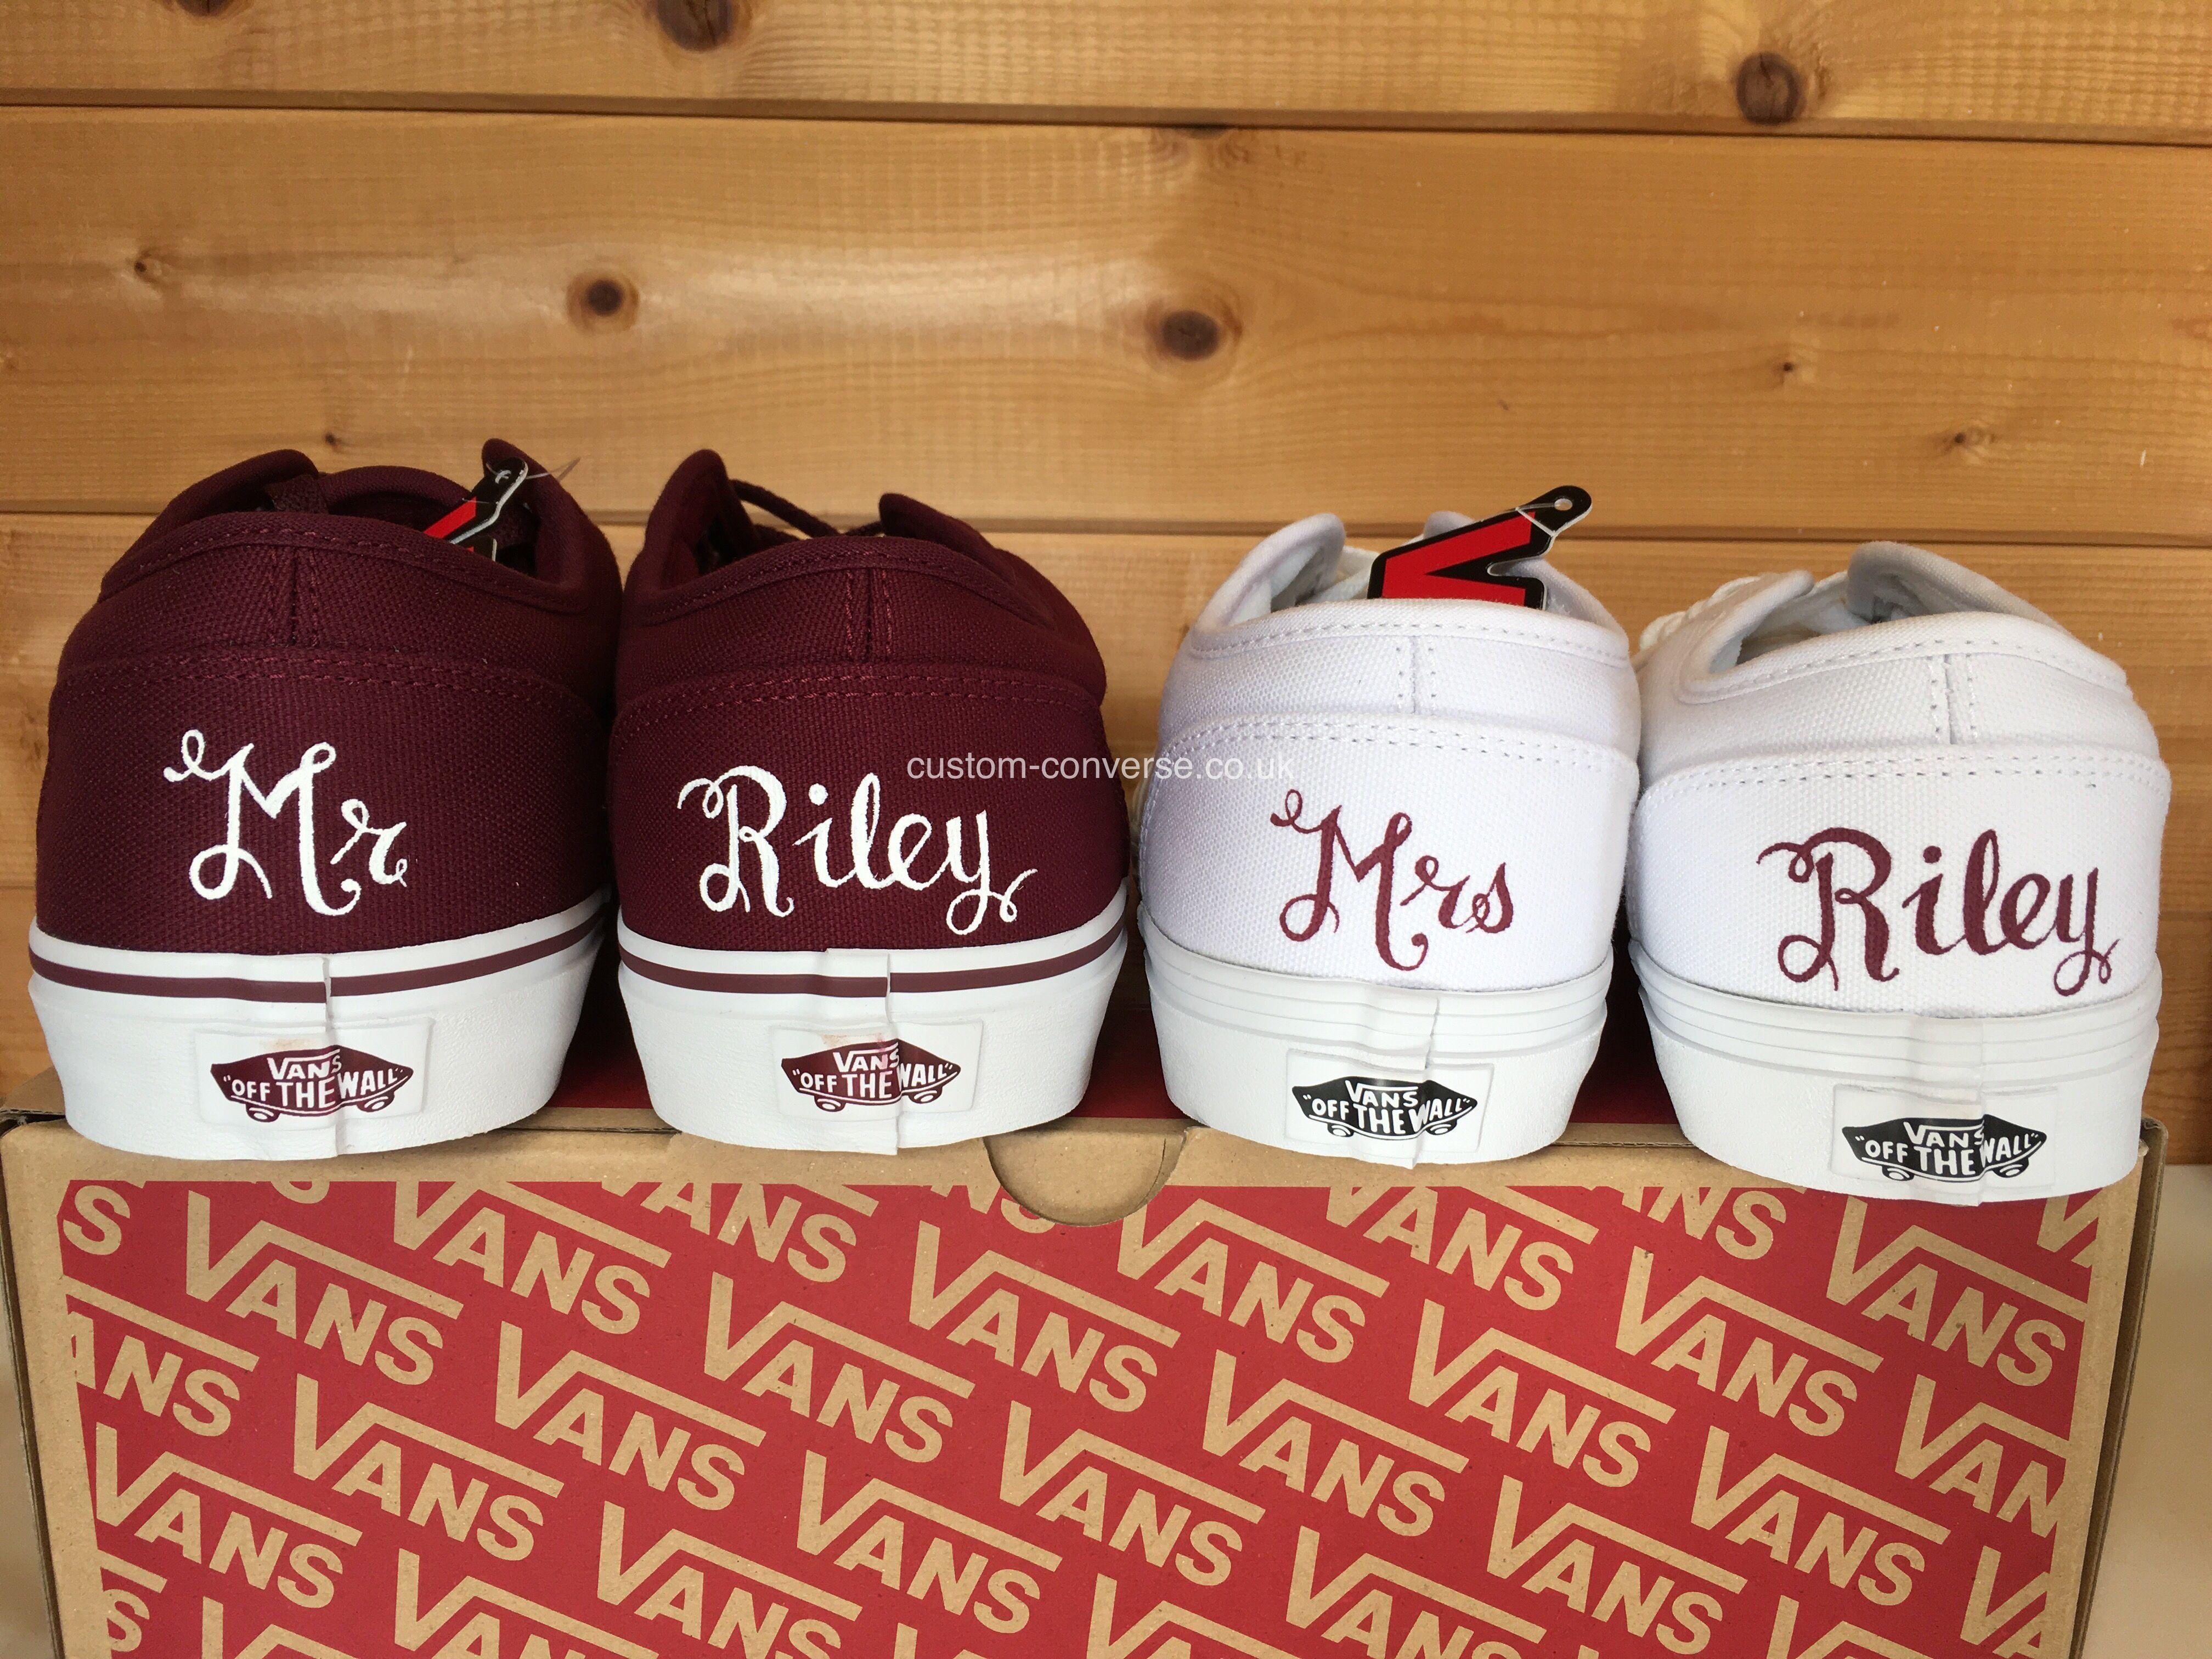 Custom Vans Wedding Shoes Online Sale, UP TO 58% OFF